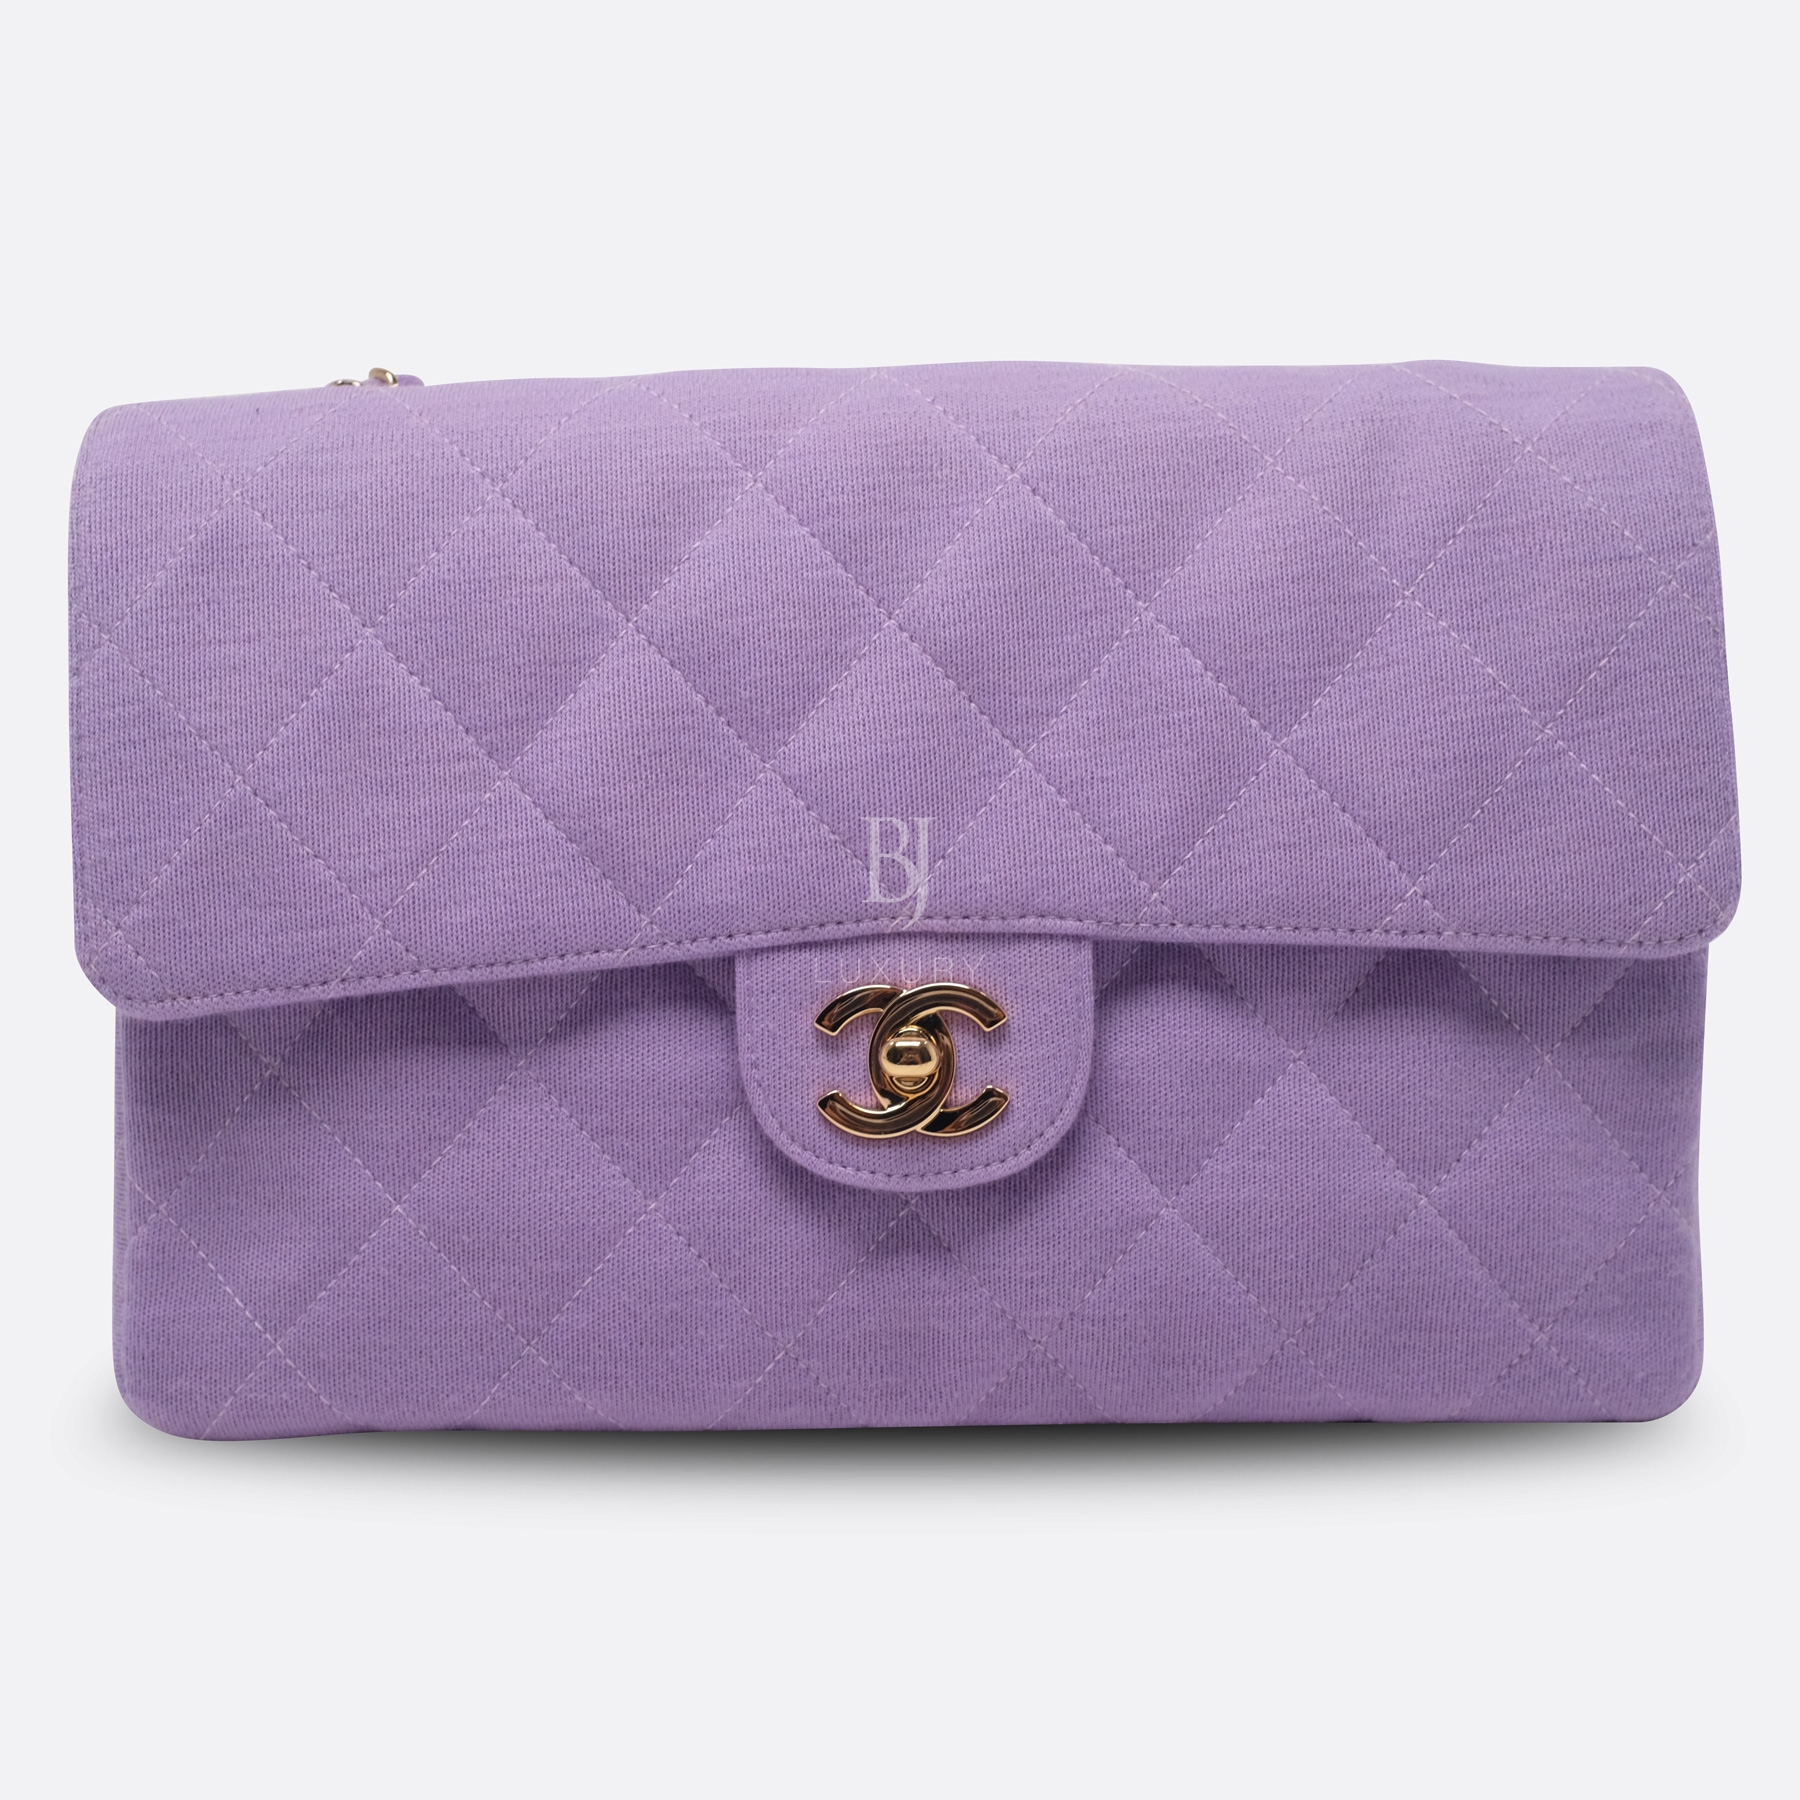 Chanel Flap Bag Medium Jersey Gold Lilac BJ Luxury 1.jpg